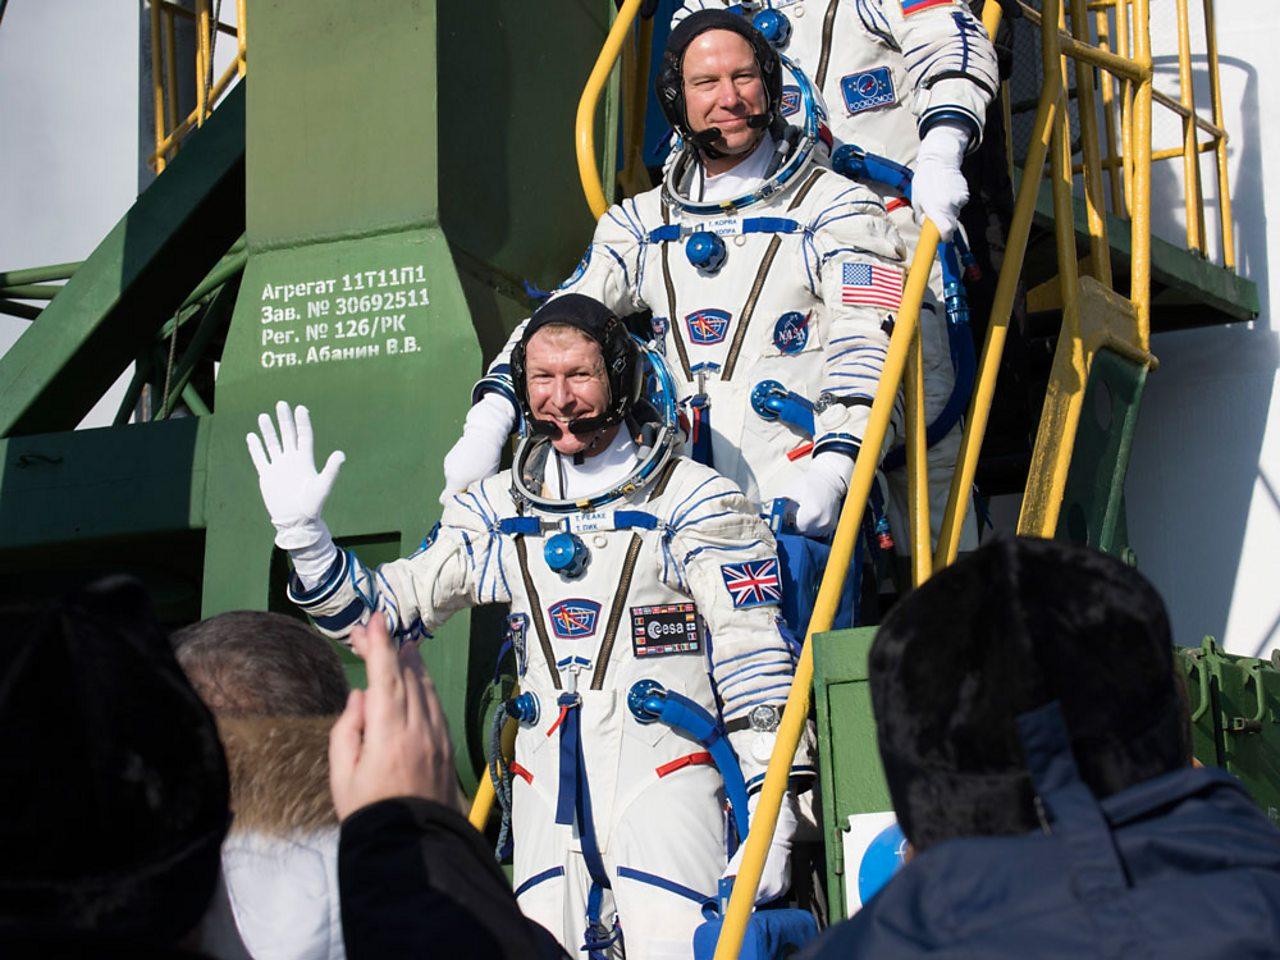 Tim Peake waving goodbye from the steps of the Soyuz rocket.